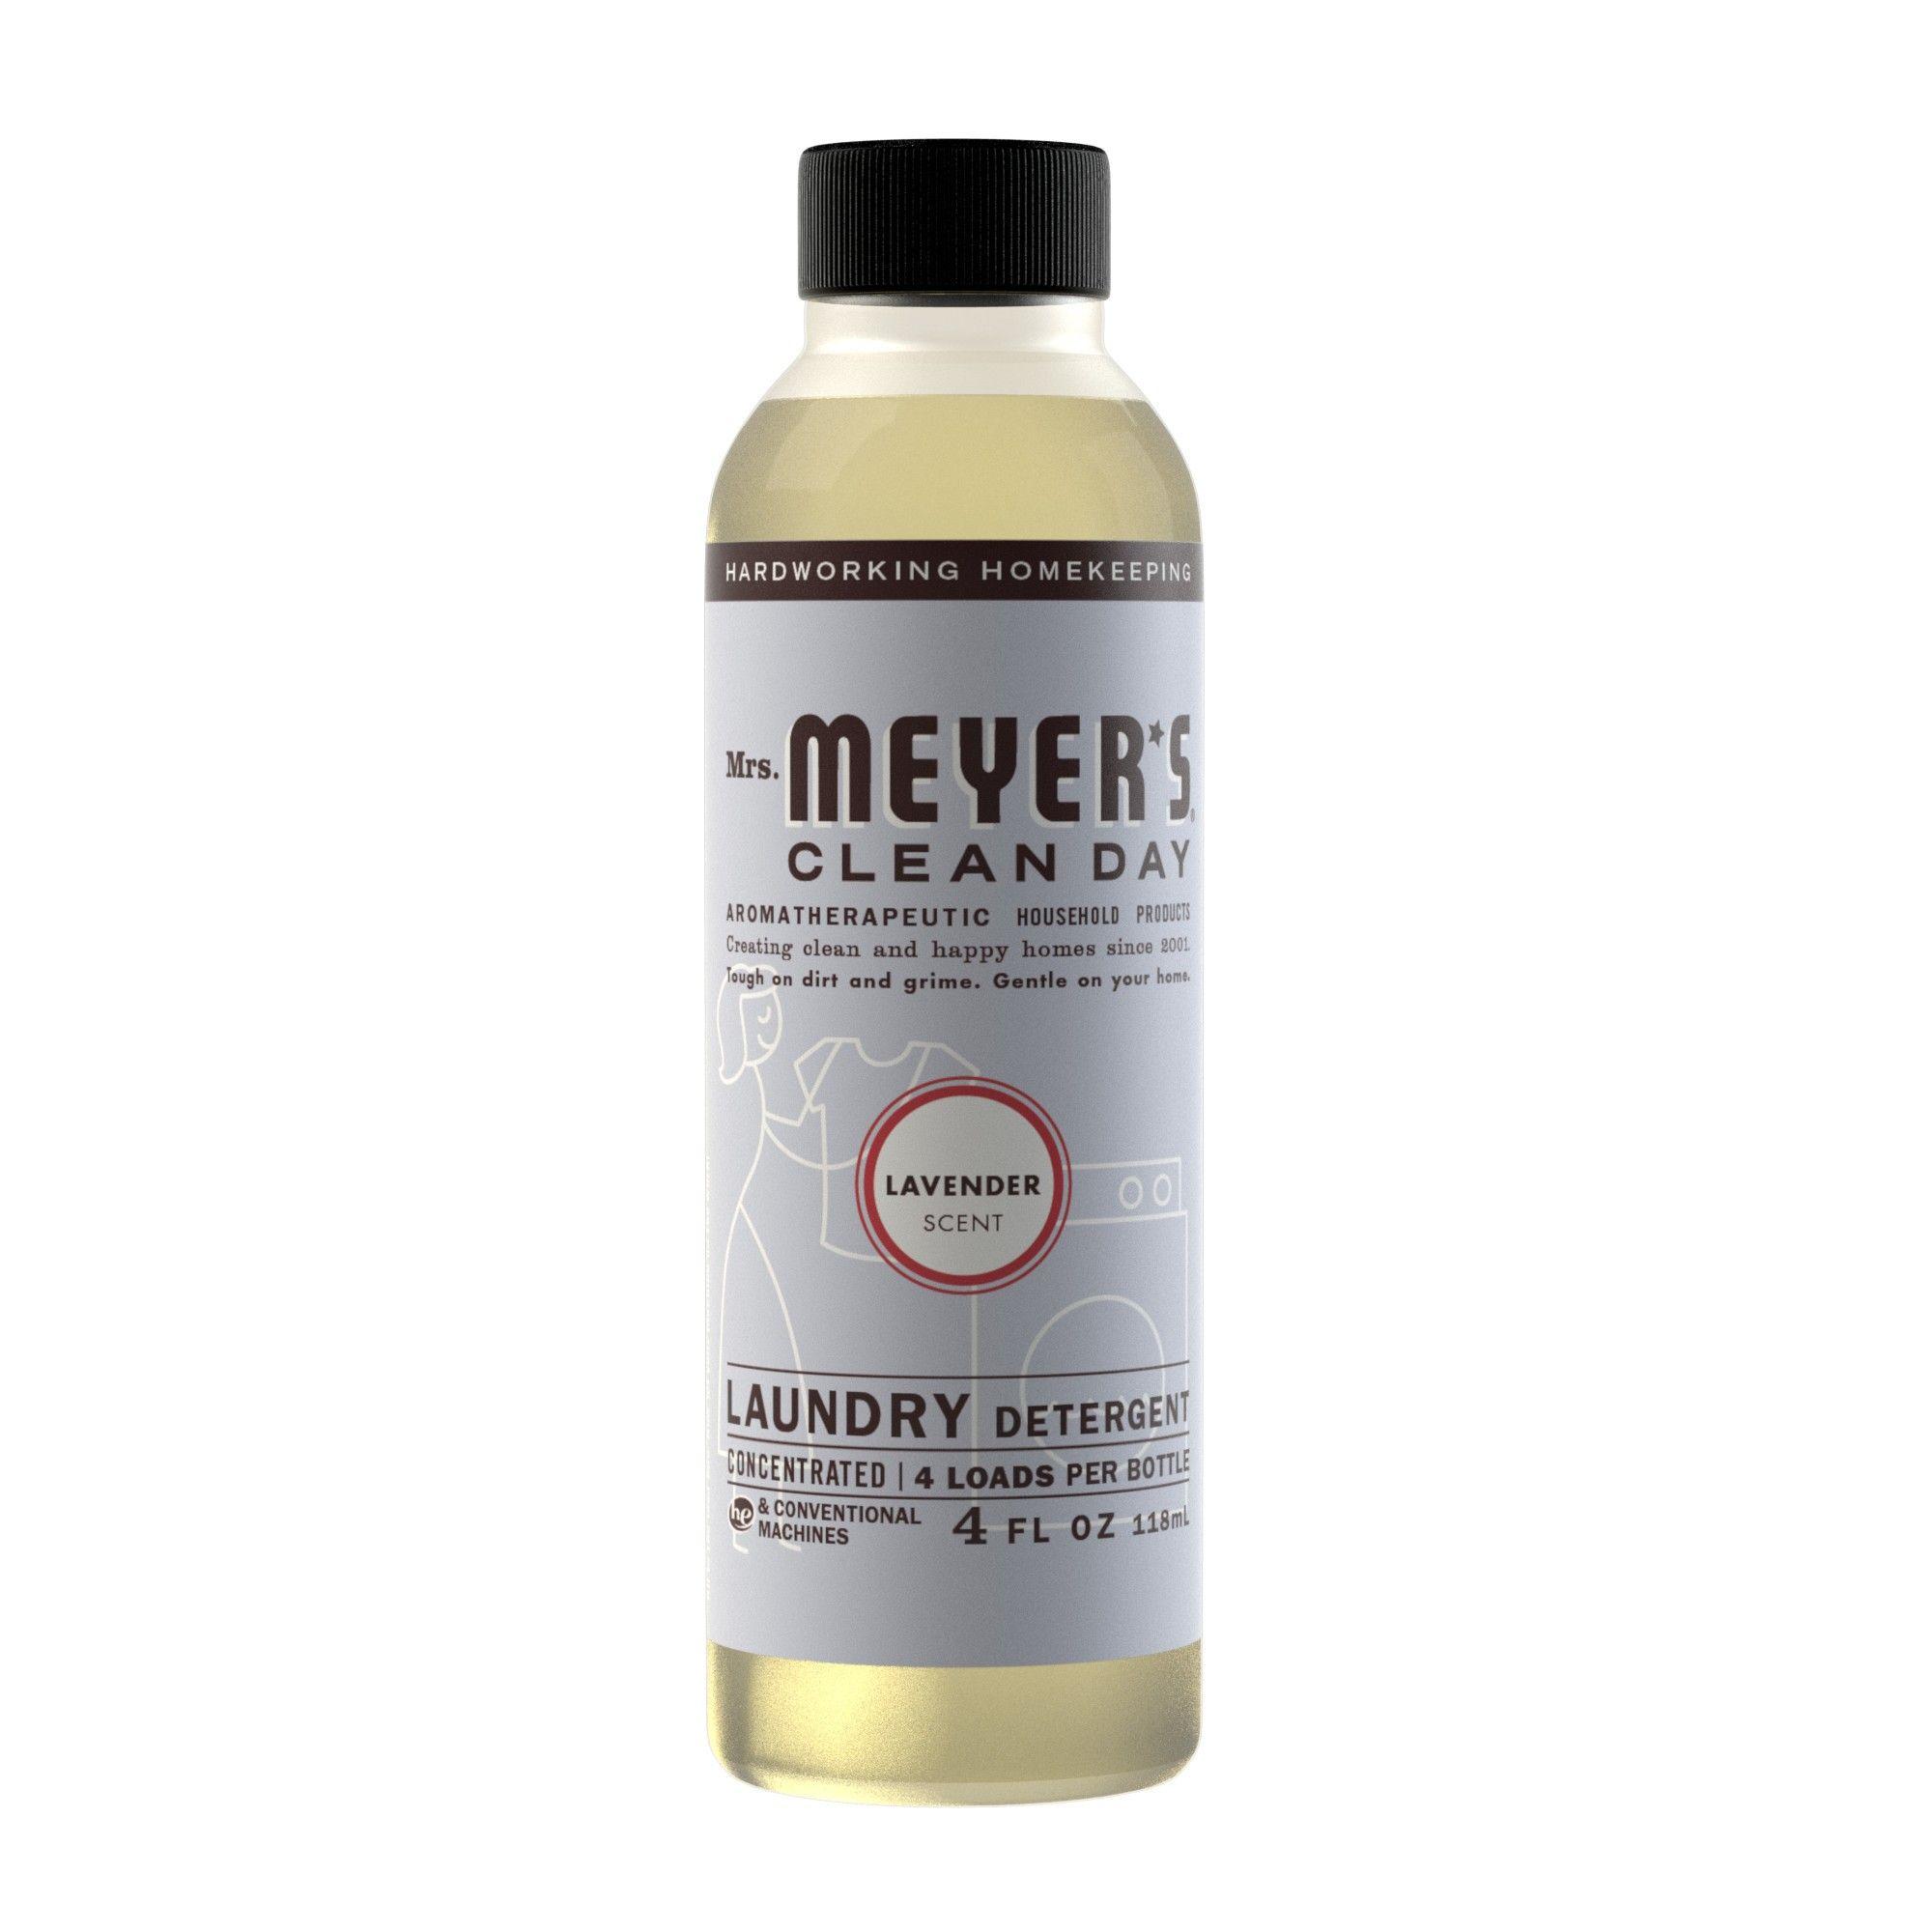 Mrs Meyer S Lavender Scented Laundry Detergent 4 Fl Oz